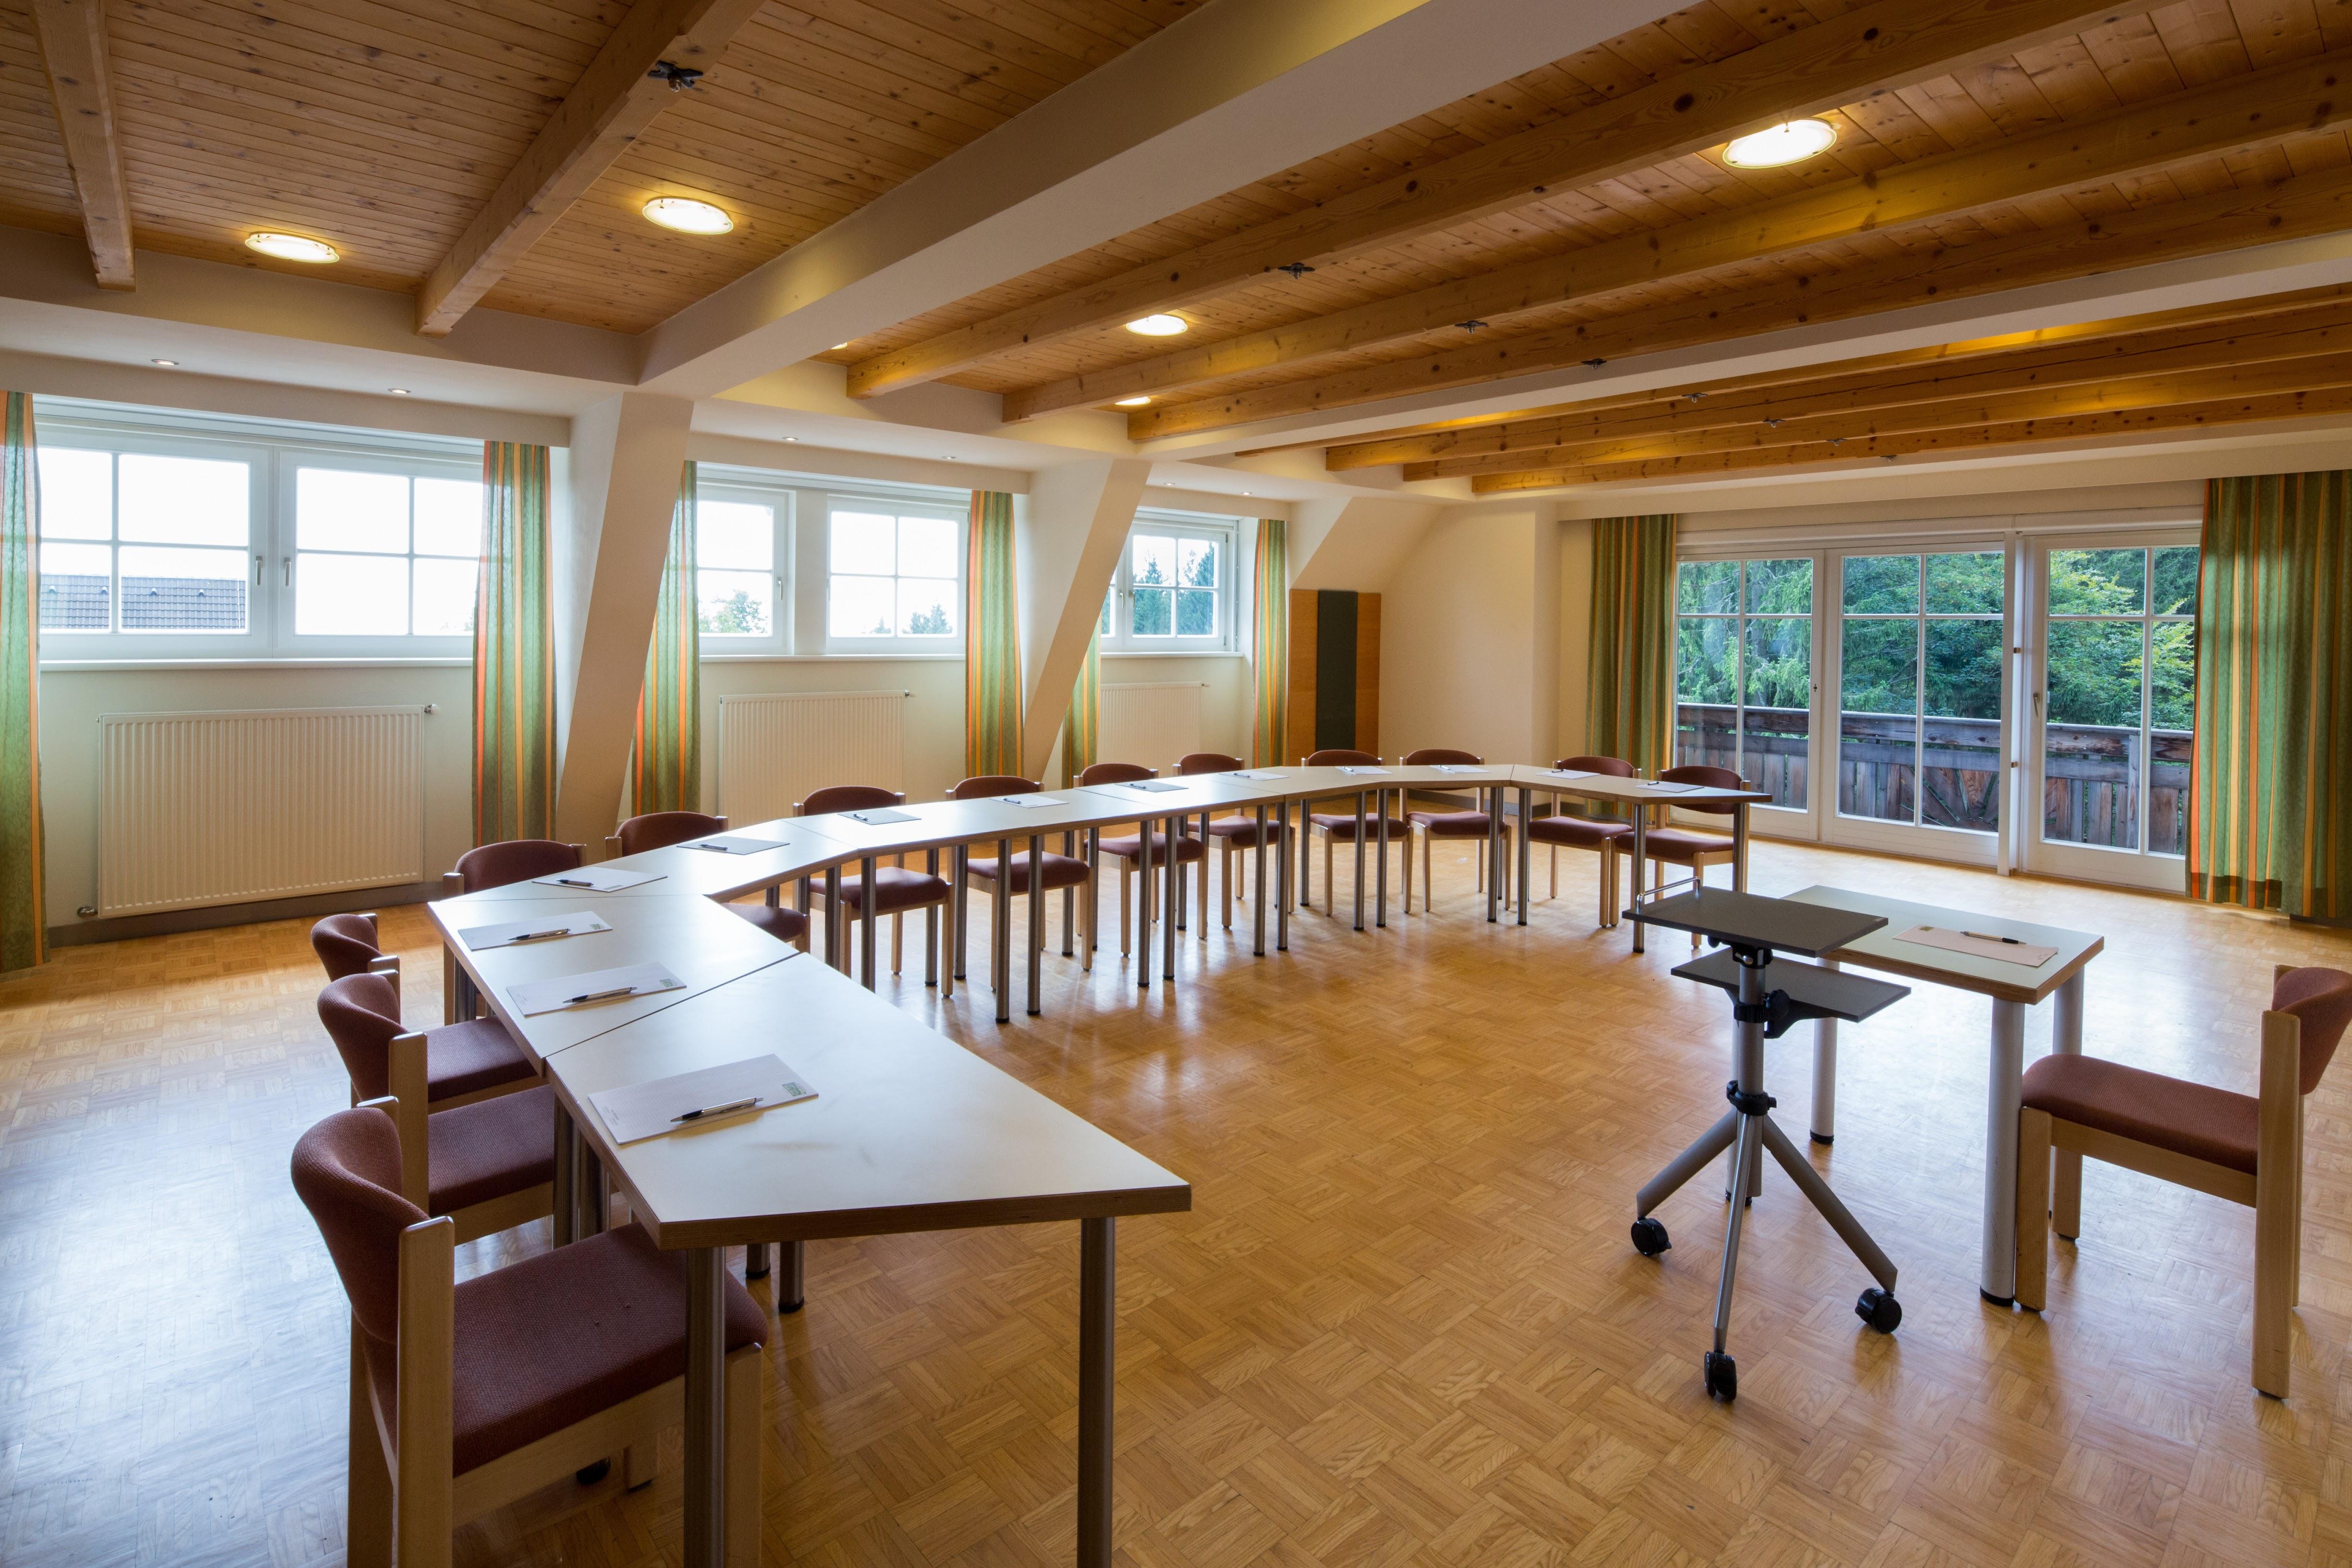 Seminarhotel Steiermark Sankt Stefan 10 Seminarräume